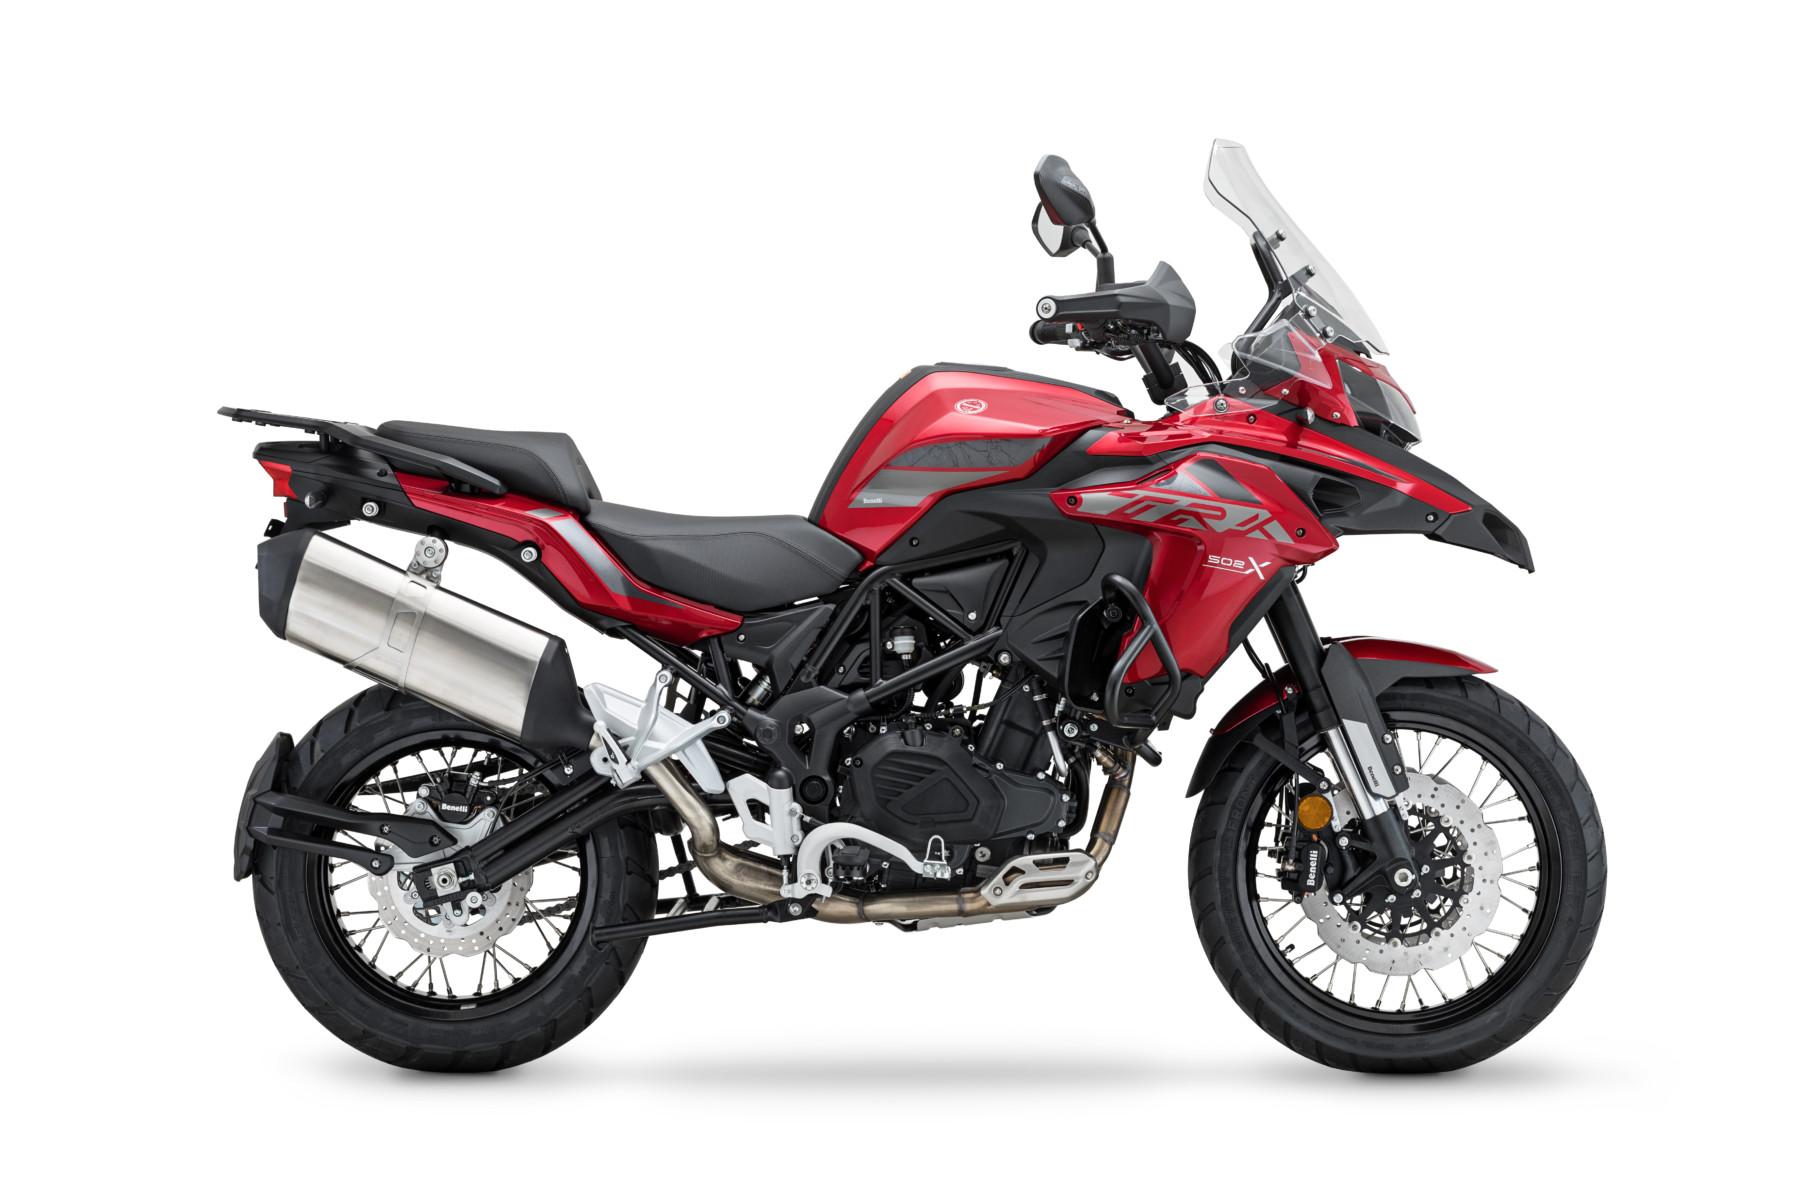 TRK502X (1)